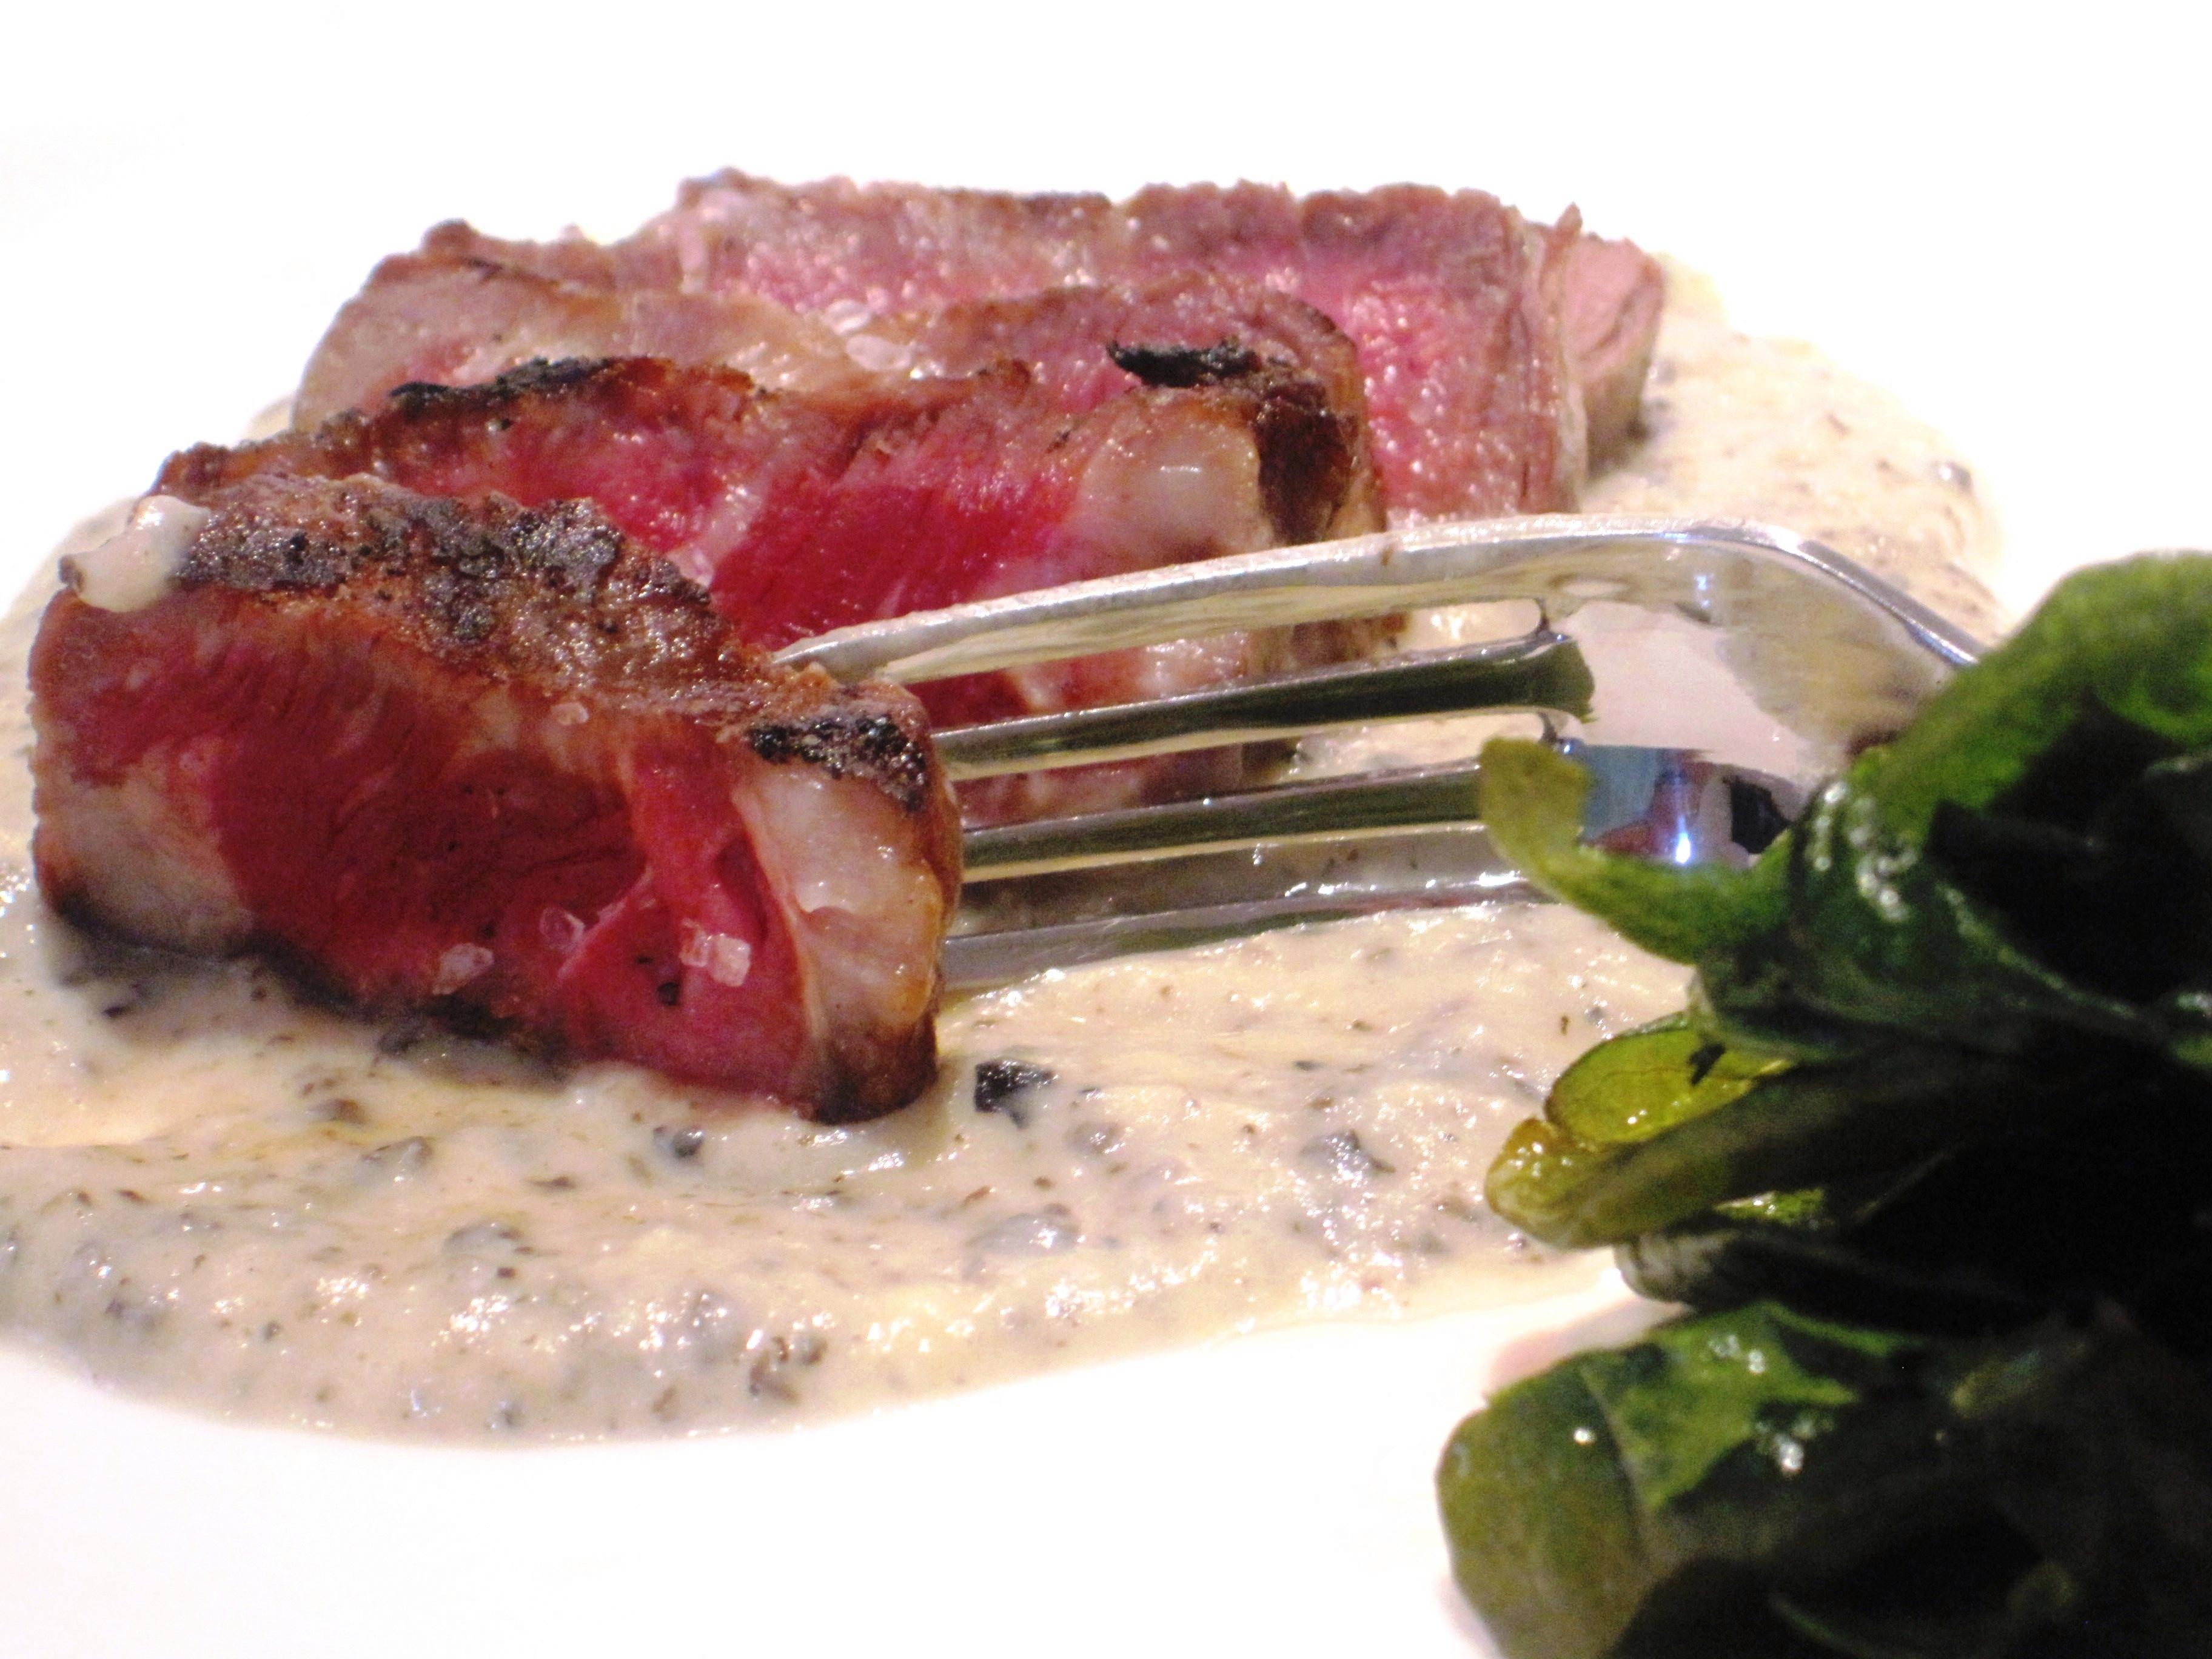 Steak and Bordeaux wine